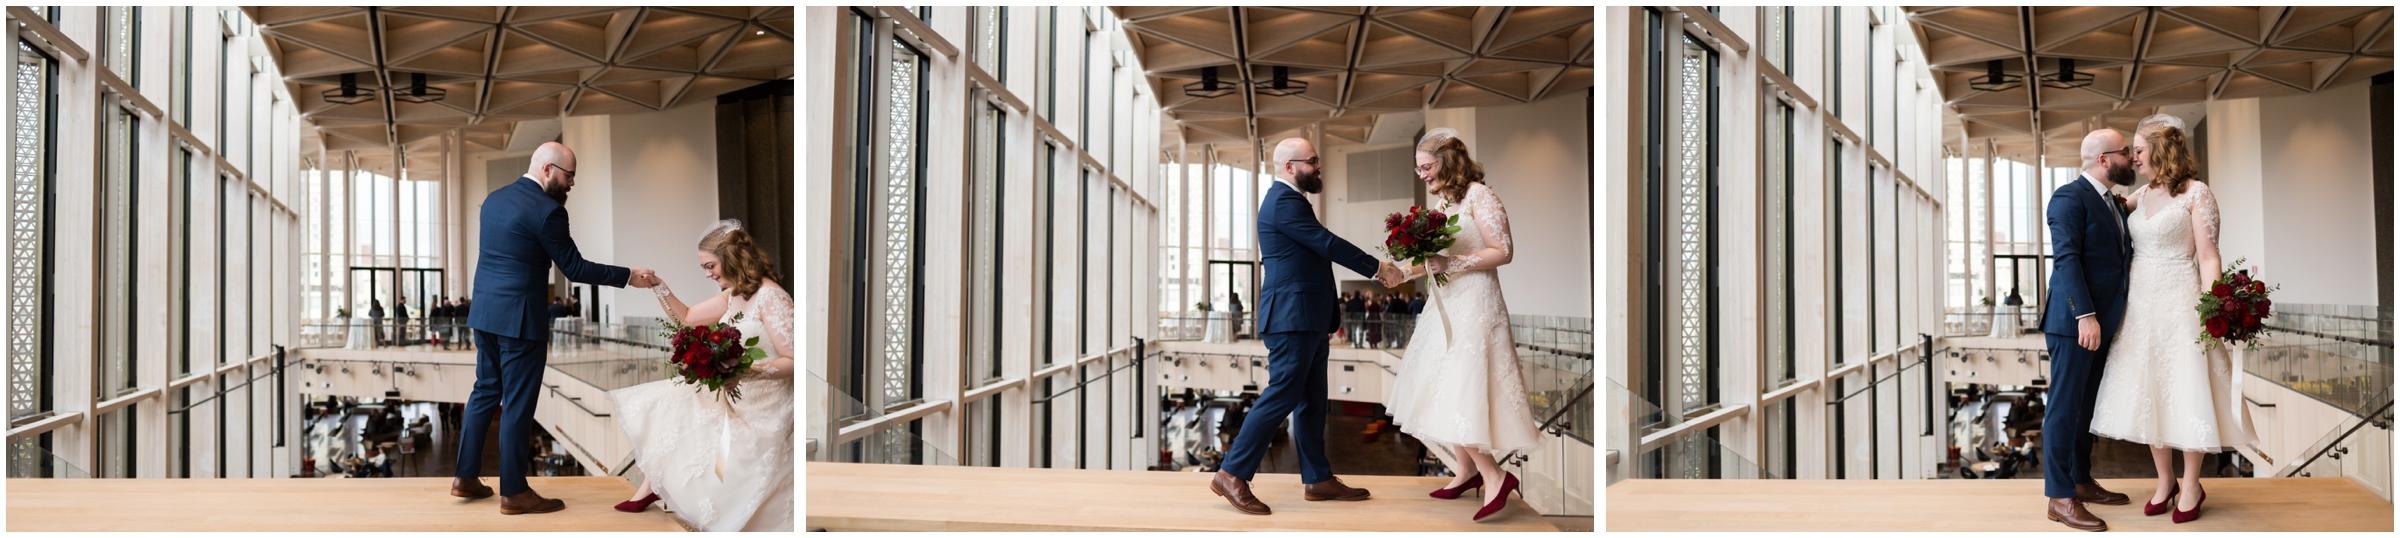 Ottaw Wedding Allison Andrew - (Selena Phillips-Boyle)_0050.jpg